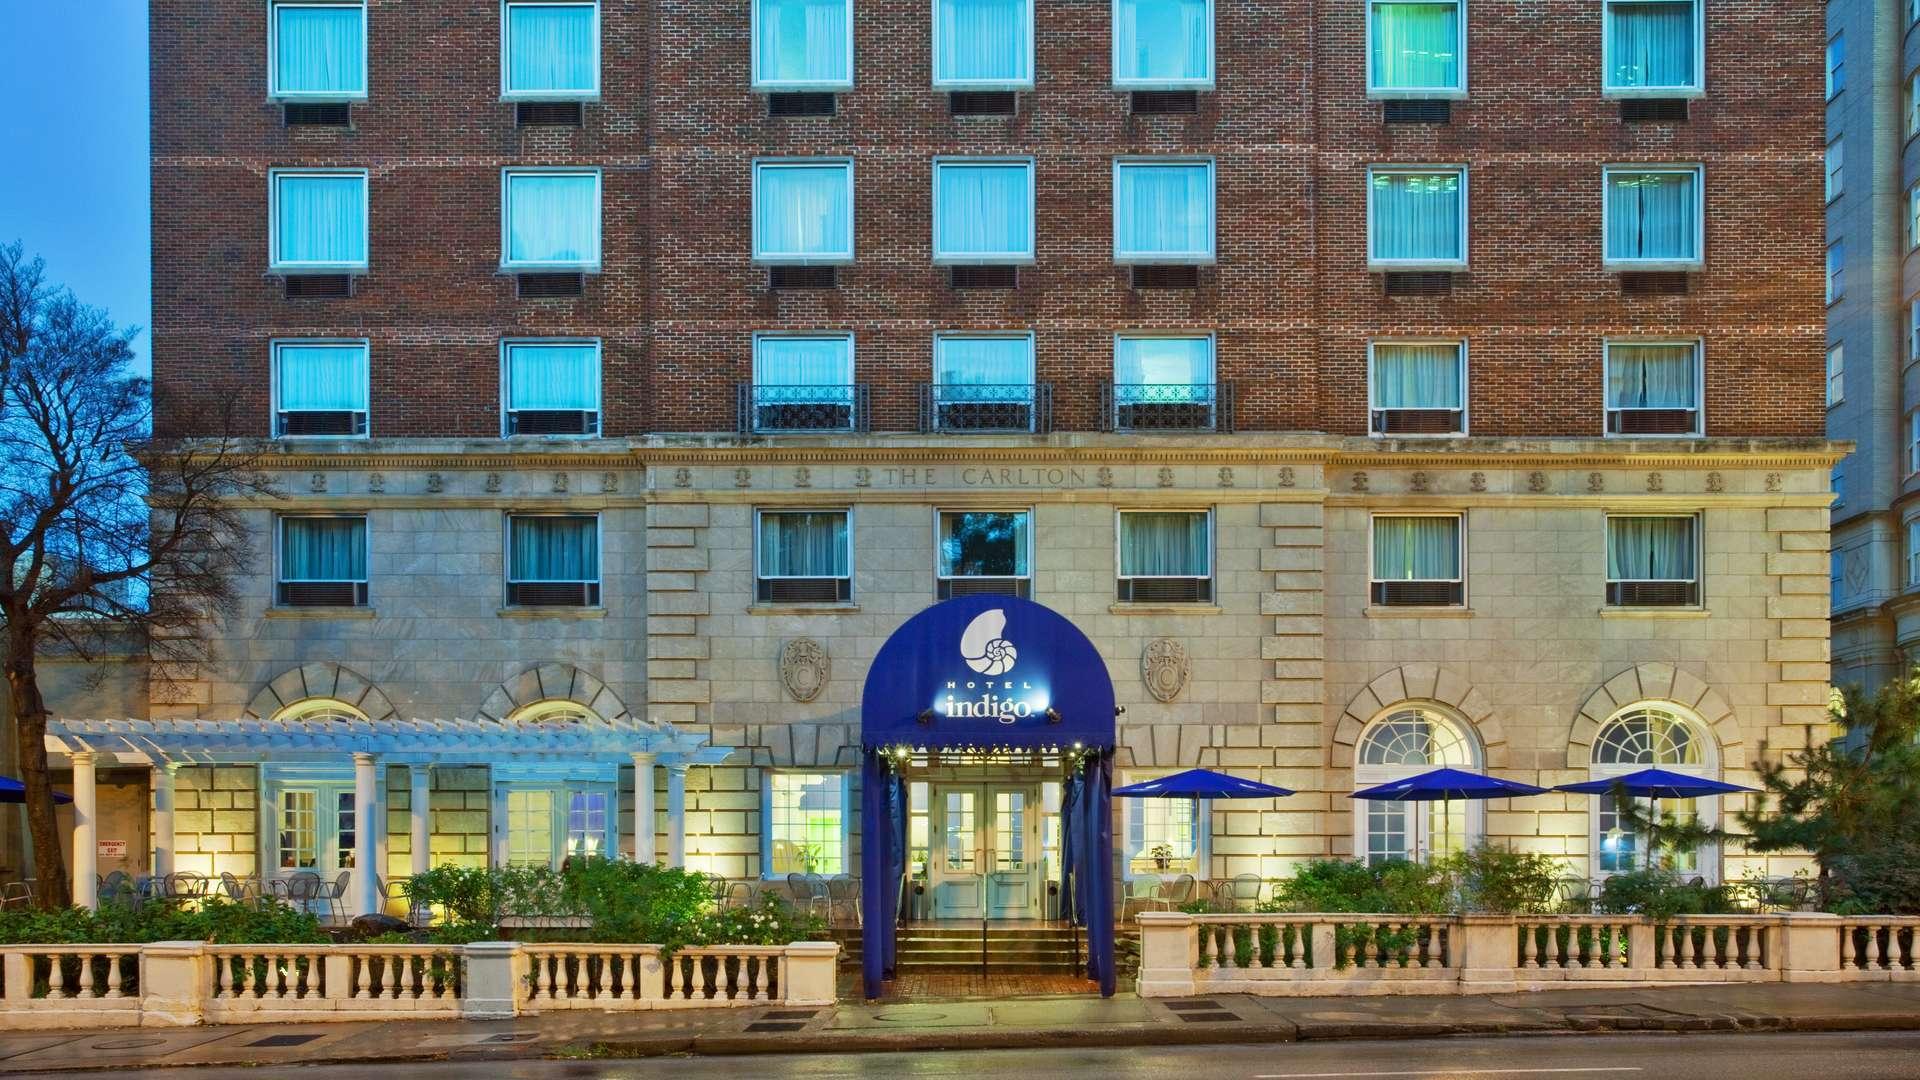 Hotel Indigo Atlanta Midtown A Kuoni Hotel In Georgia The Carolinas